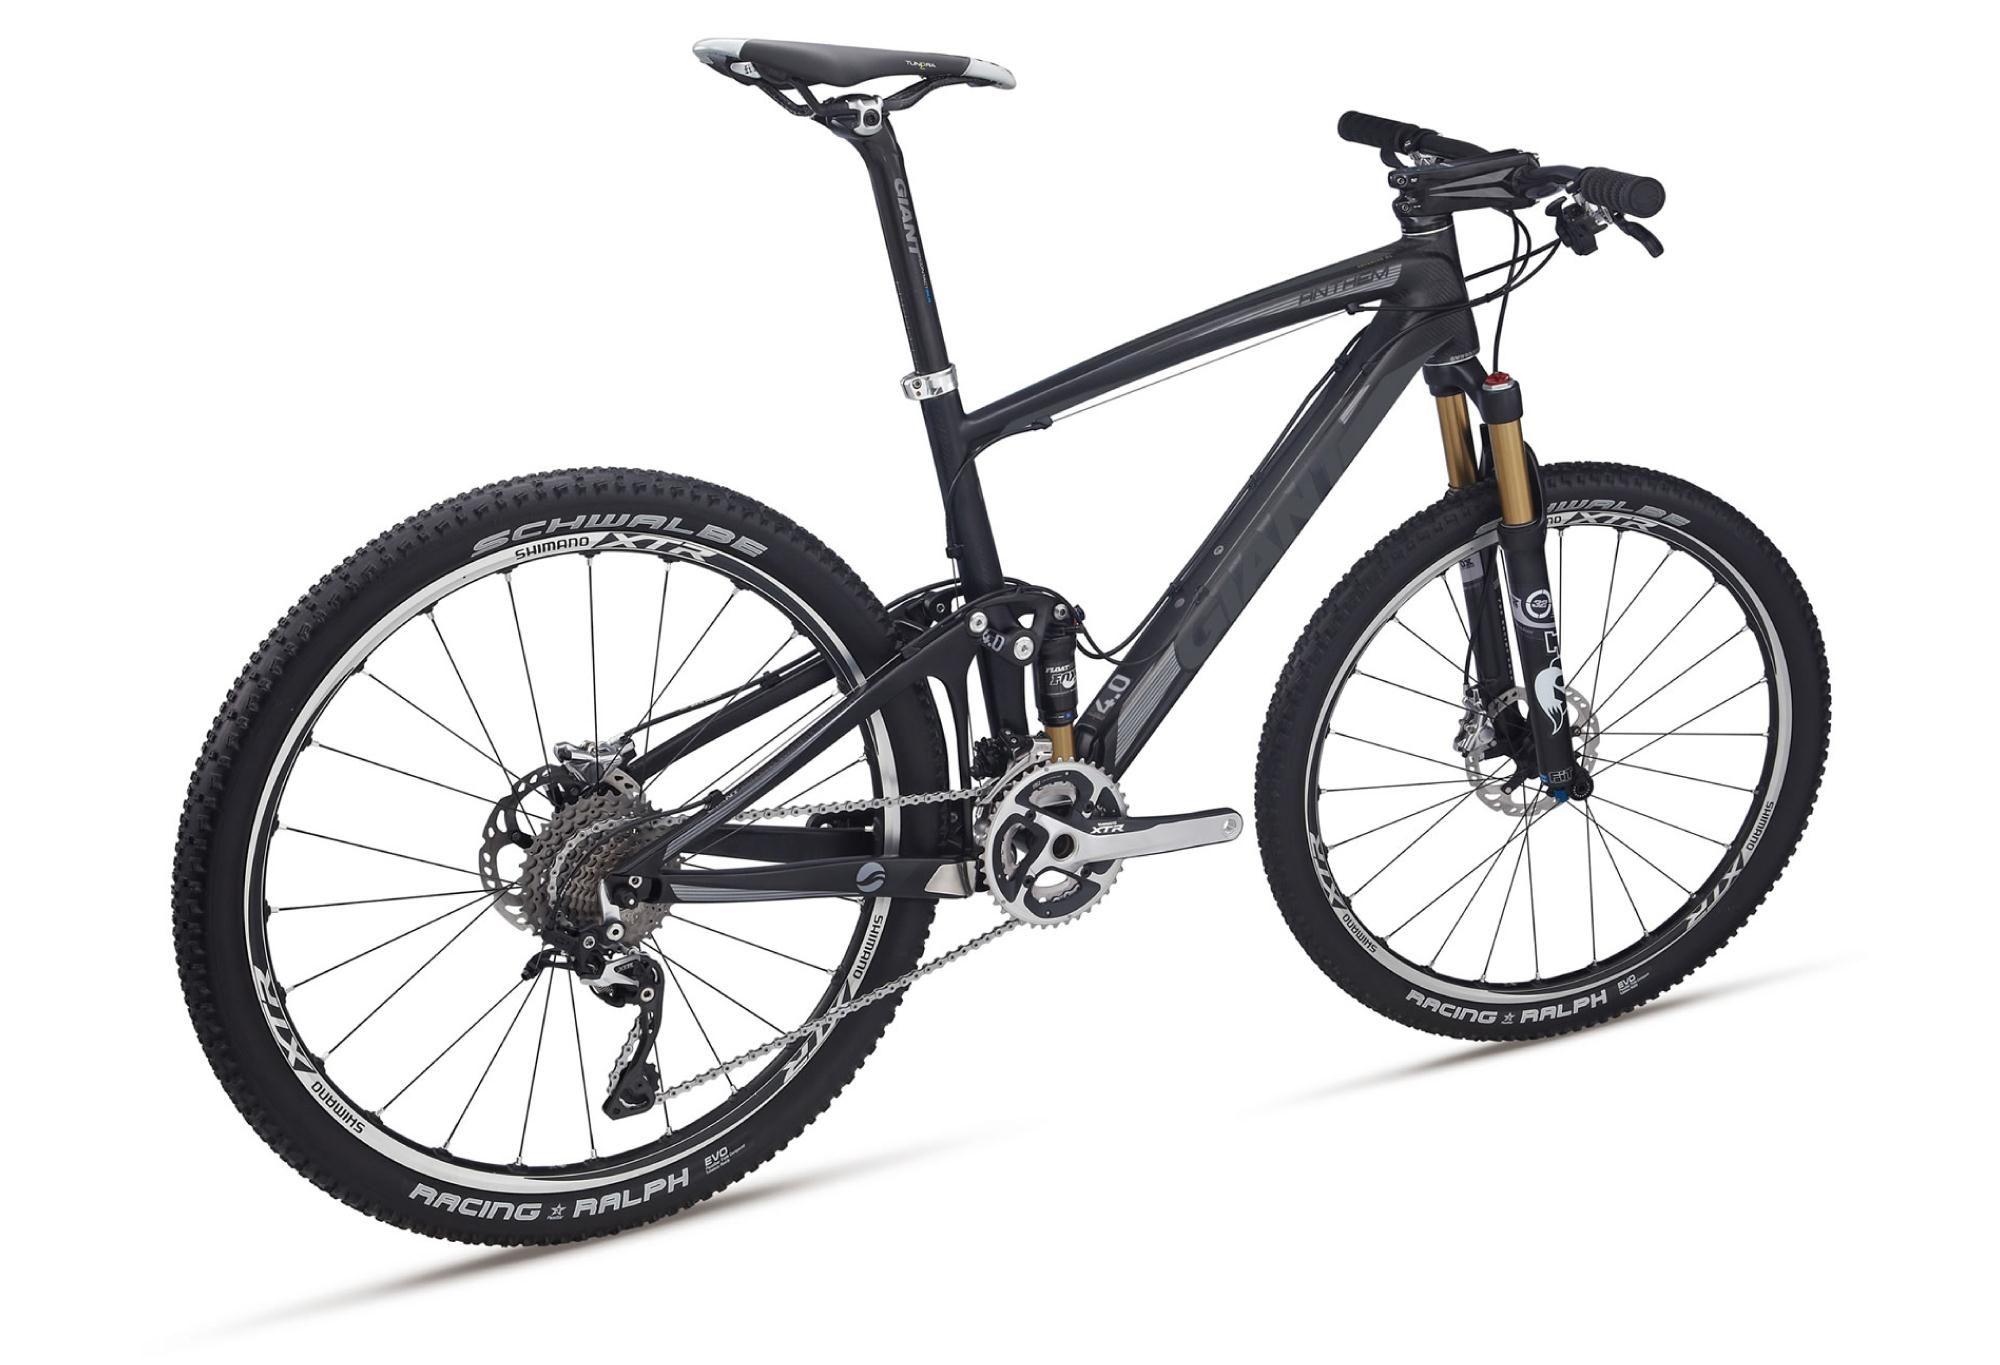 3630d339f0f Giant - Anthem X Advanced SL 0 | Bikes | Bike, Cycling, Bicycle